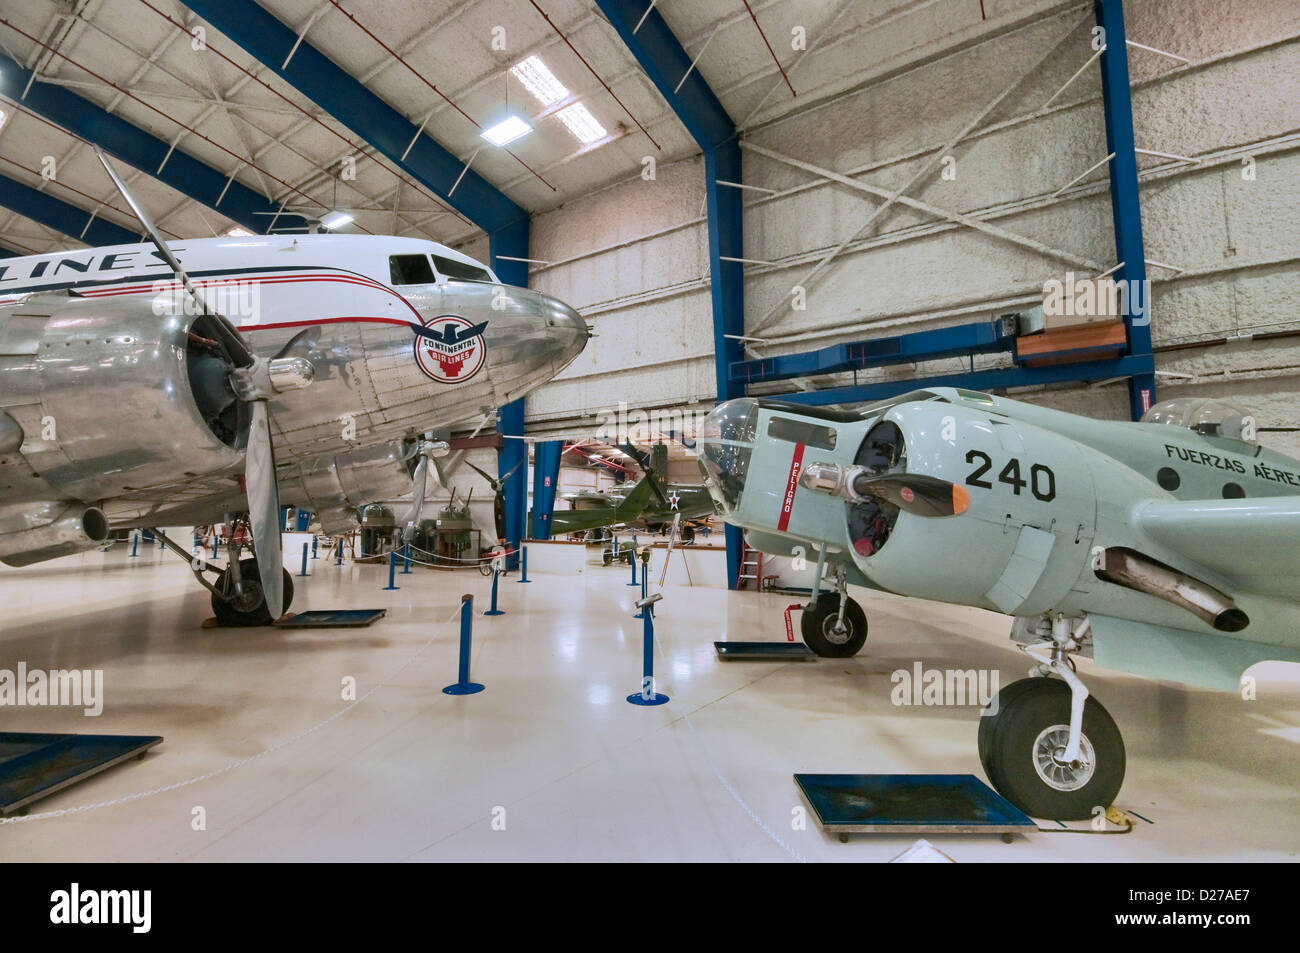 Beech AT-11 Kansan, Douglas DC-3A Dakota, at Lone Star Flight Museum, Galveston, Texas, USA Stock Photo